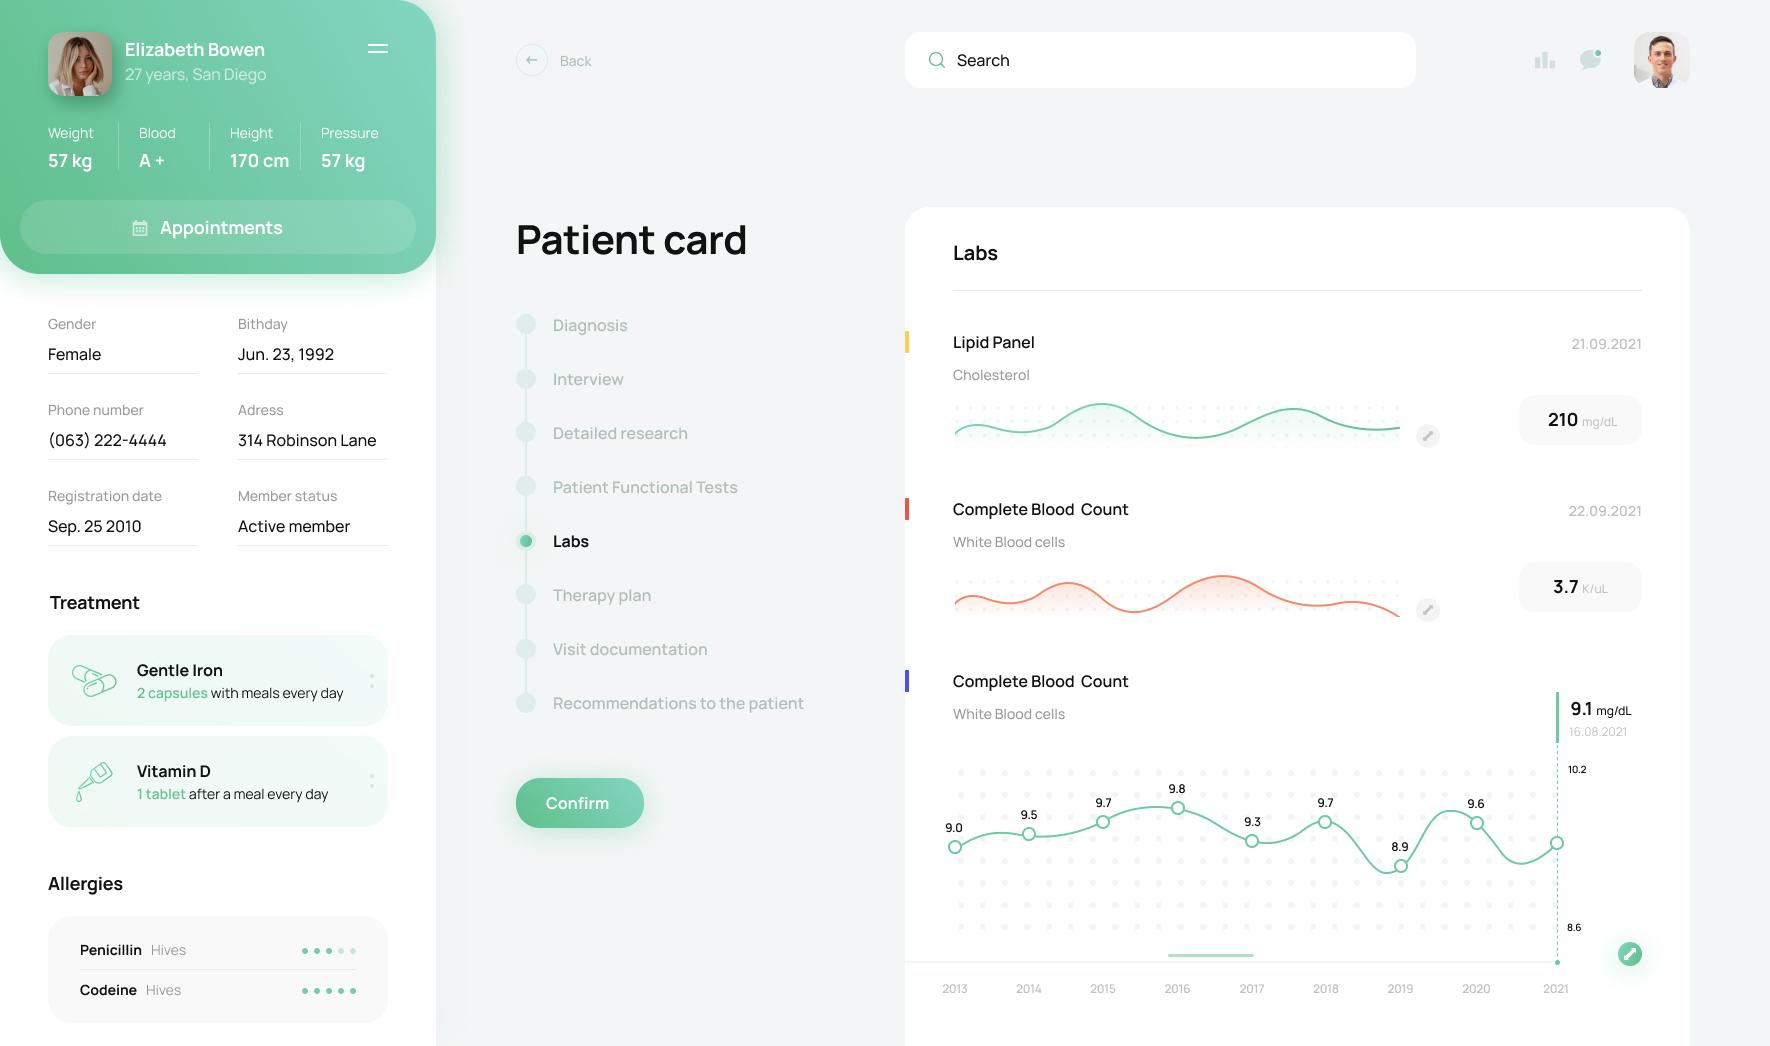 Building an Immutable Ledger for Storing Medical Records